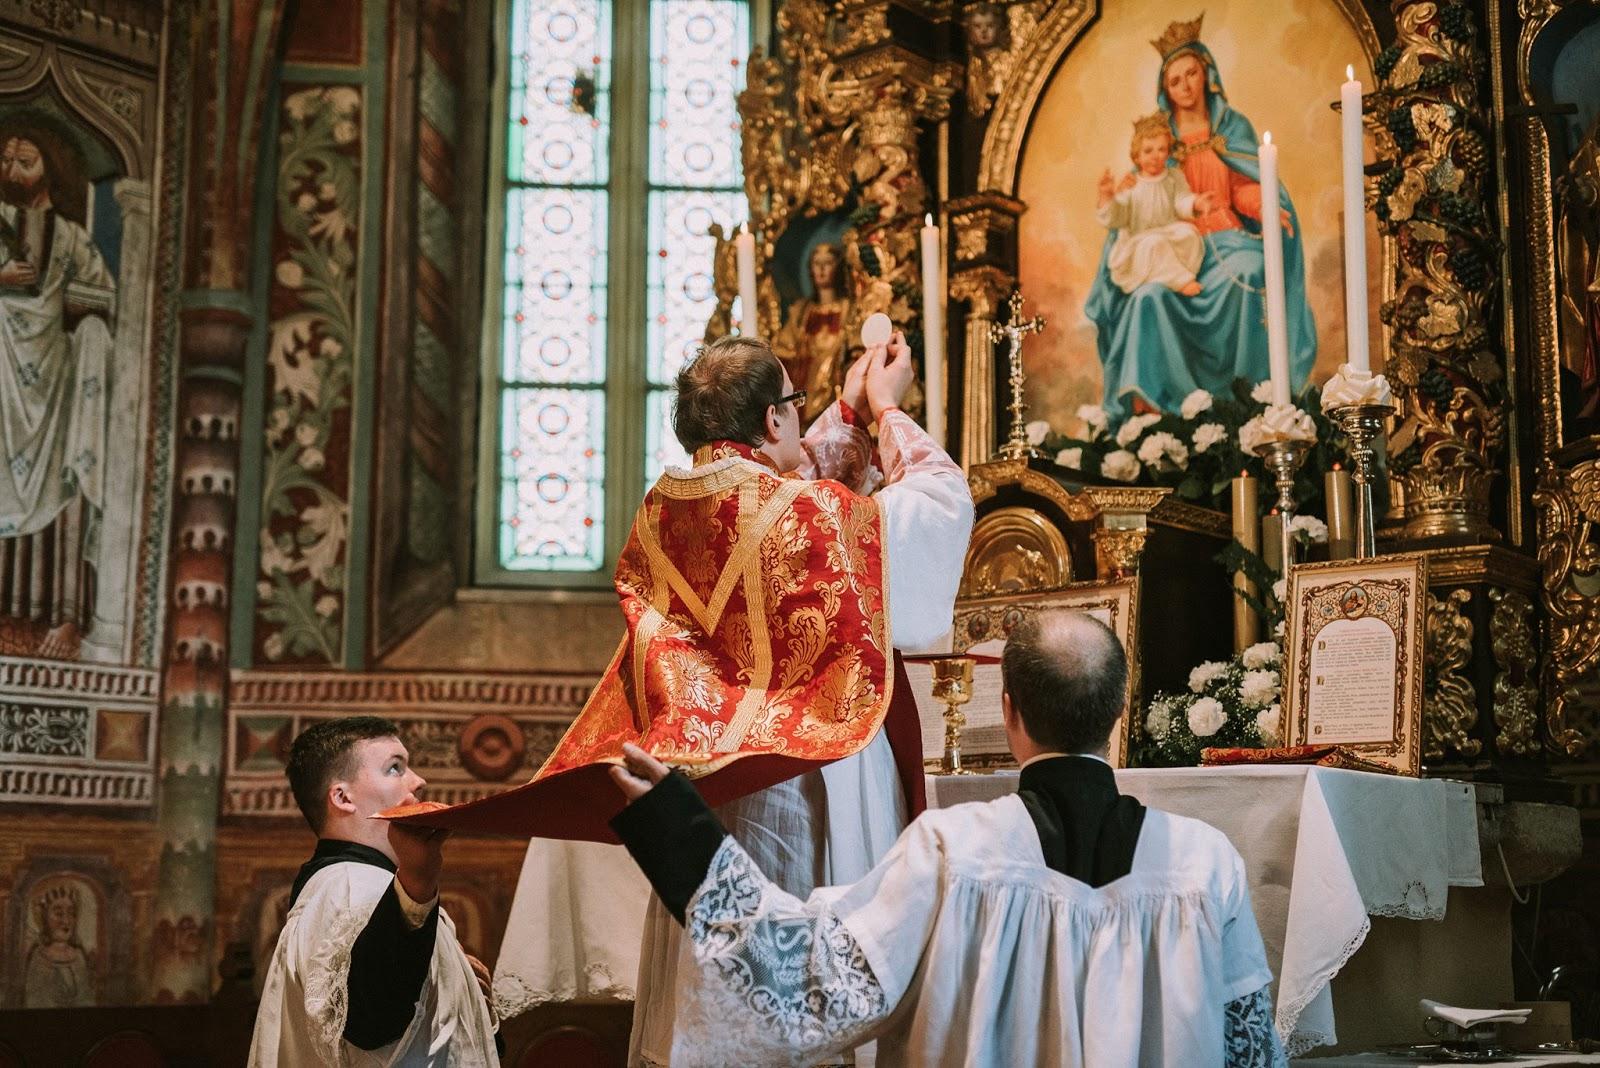 Ob deveti obletnici motuproprija Summorum Pontificum